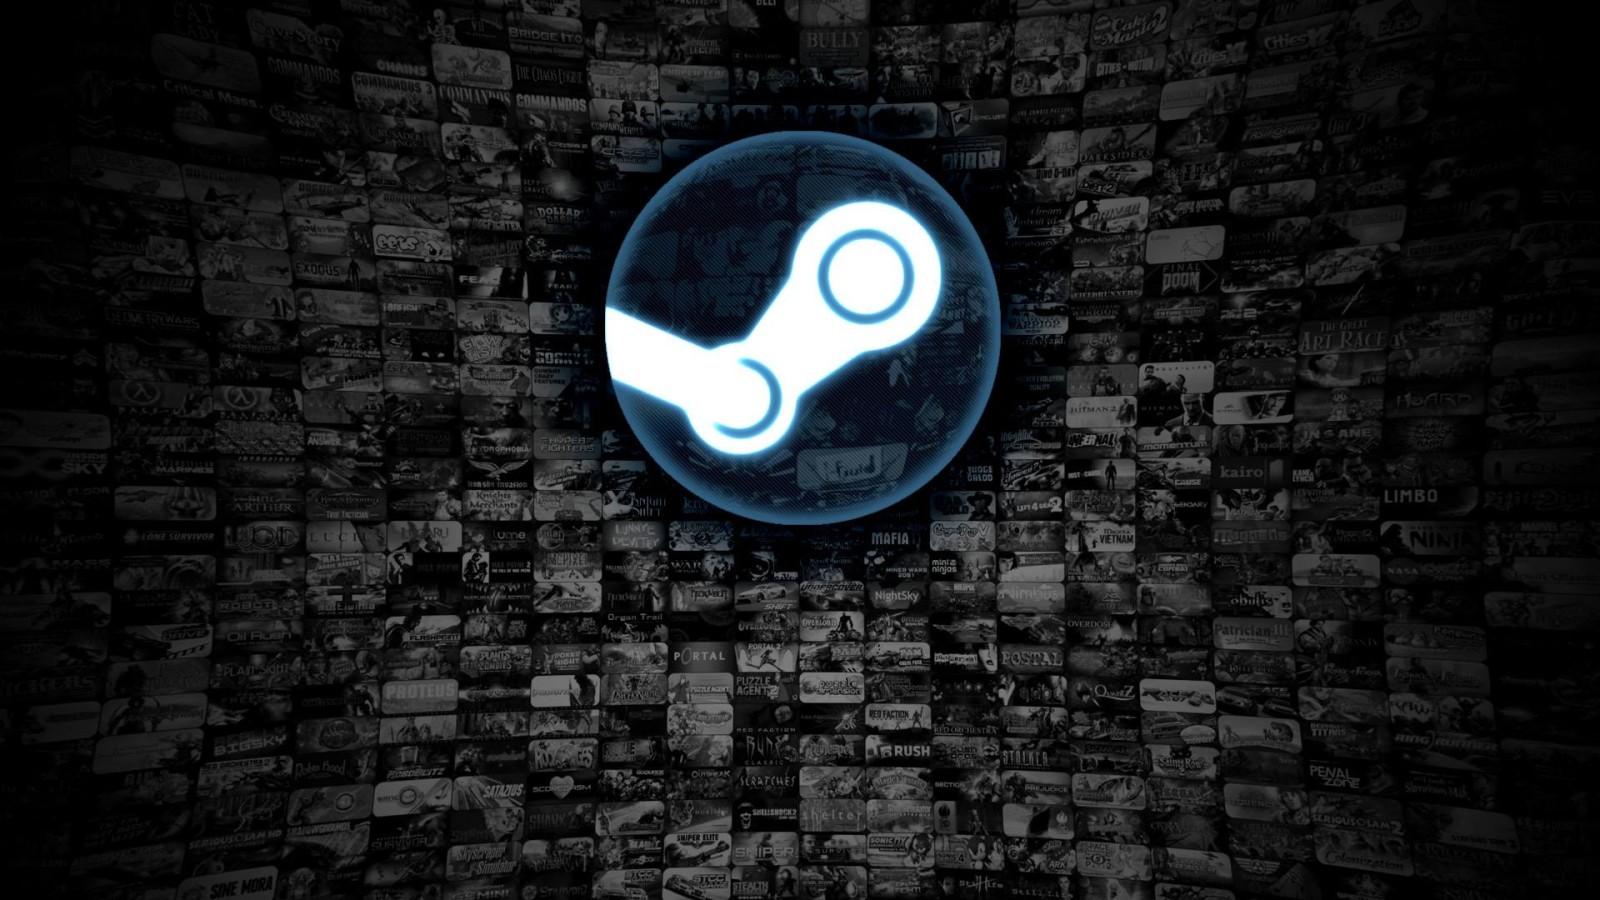 Steam对搜索进行大幅度改进:威力更强大、使用更轻松